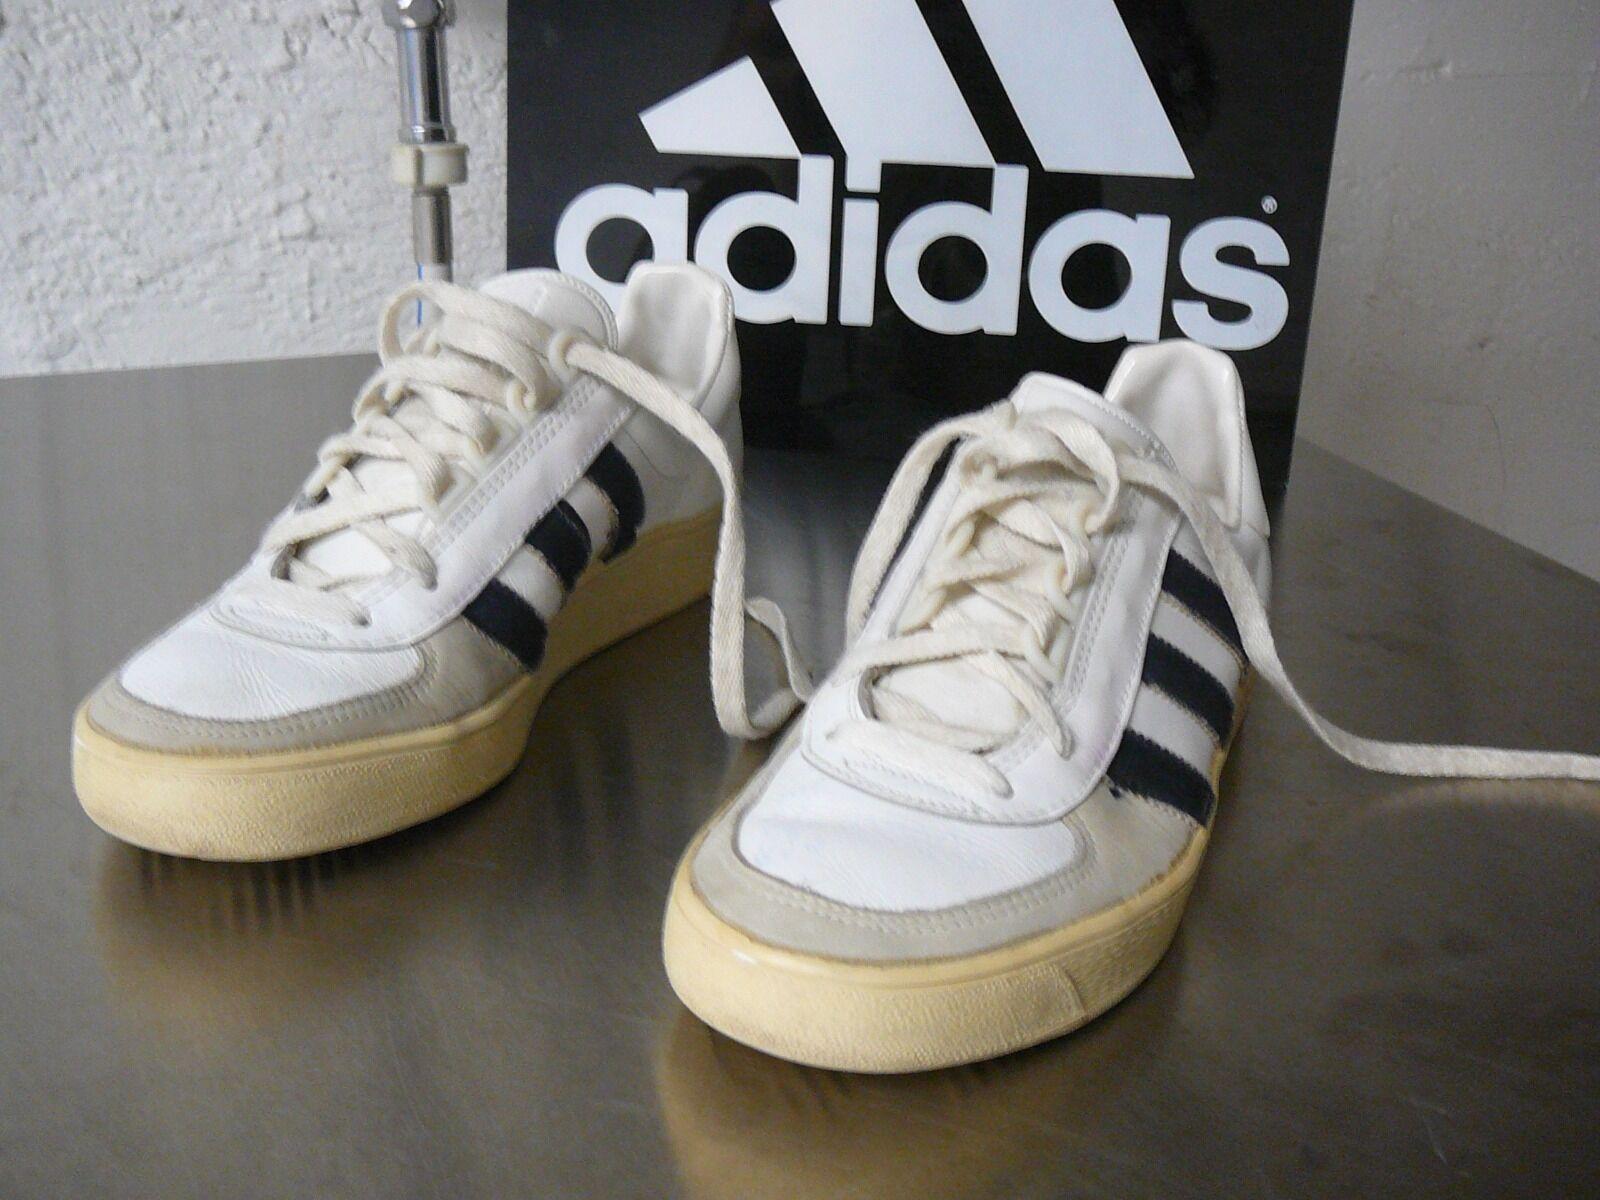 adidas vintage adiFarbe 1 superstar vintage 80s Turnschuhe Schuhe UK 5  oldschool